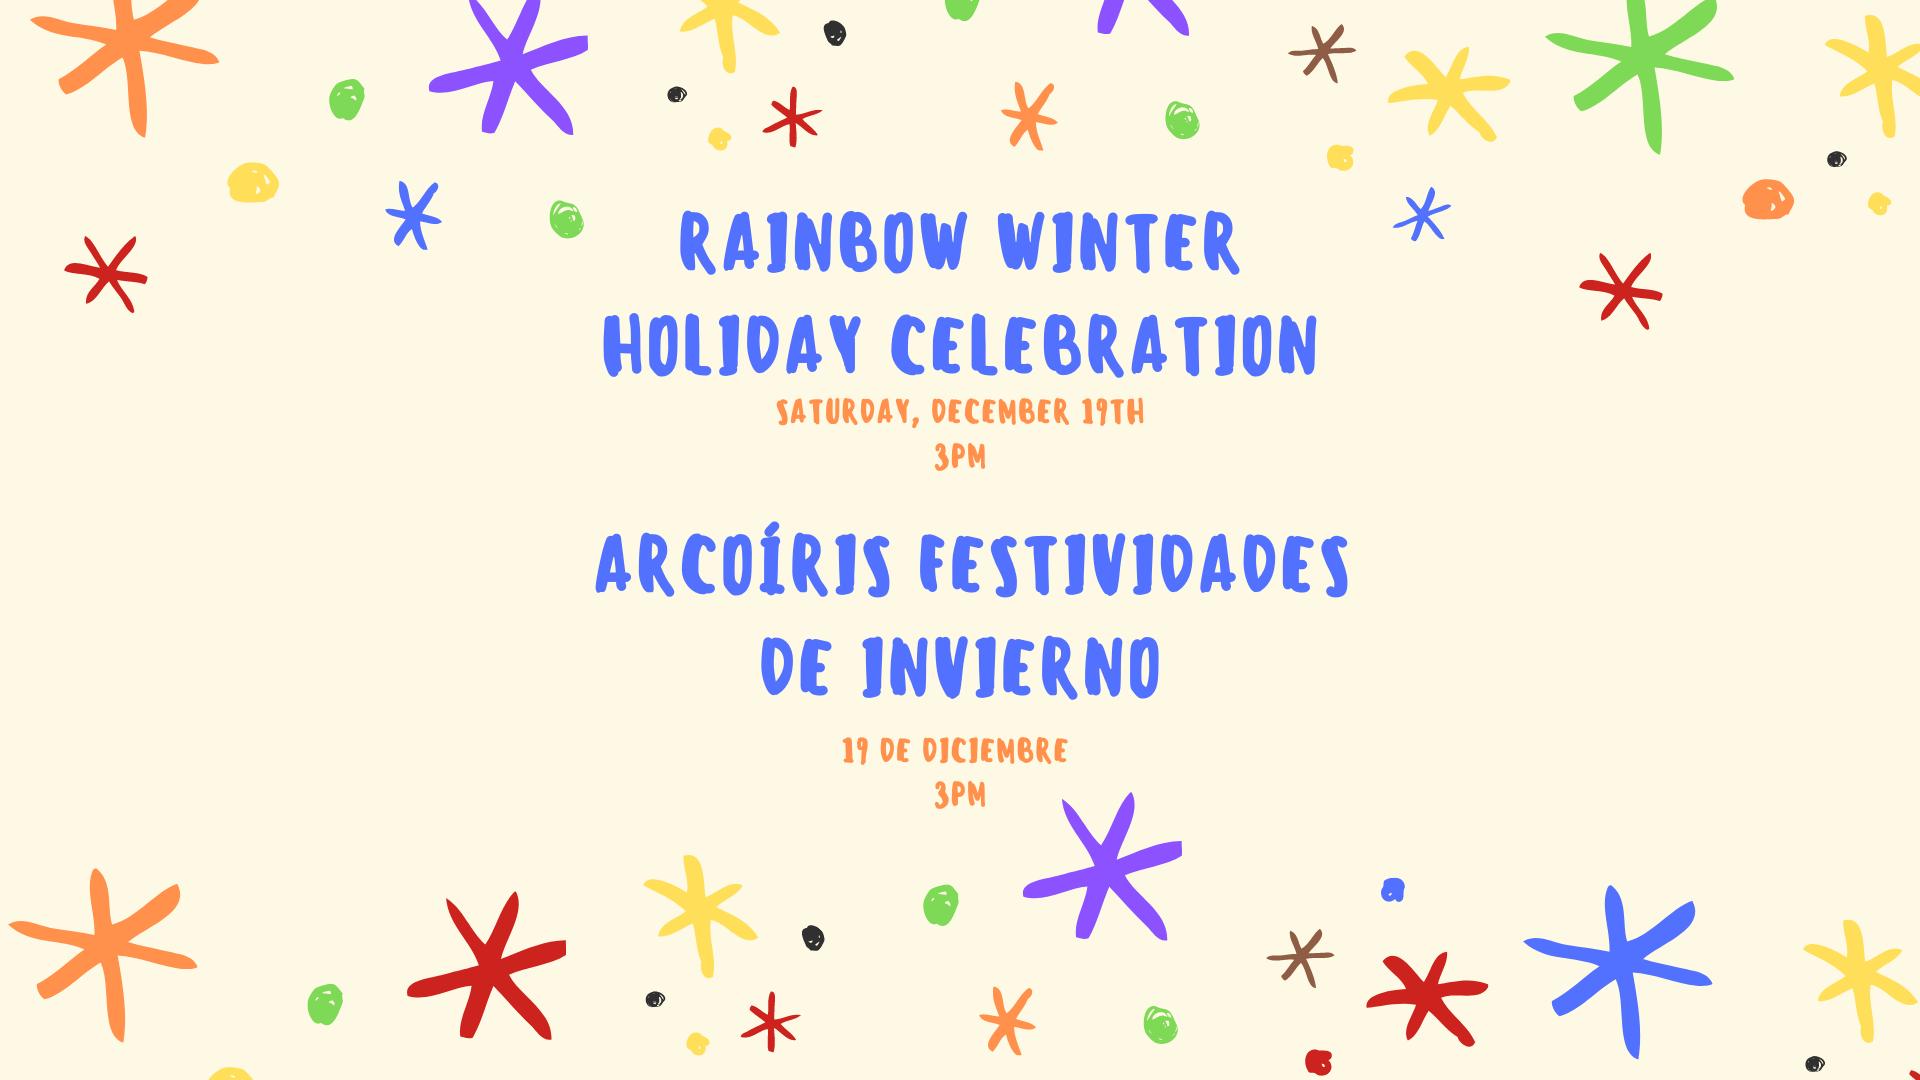 Rainbow Winter Holiday Celebration